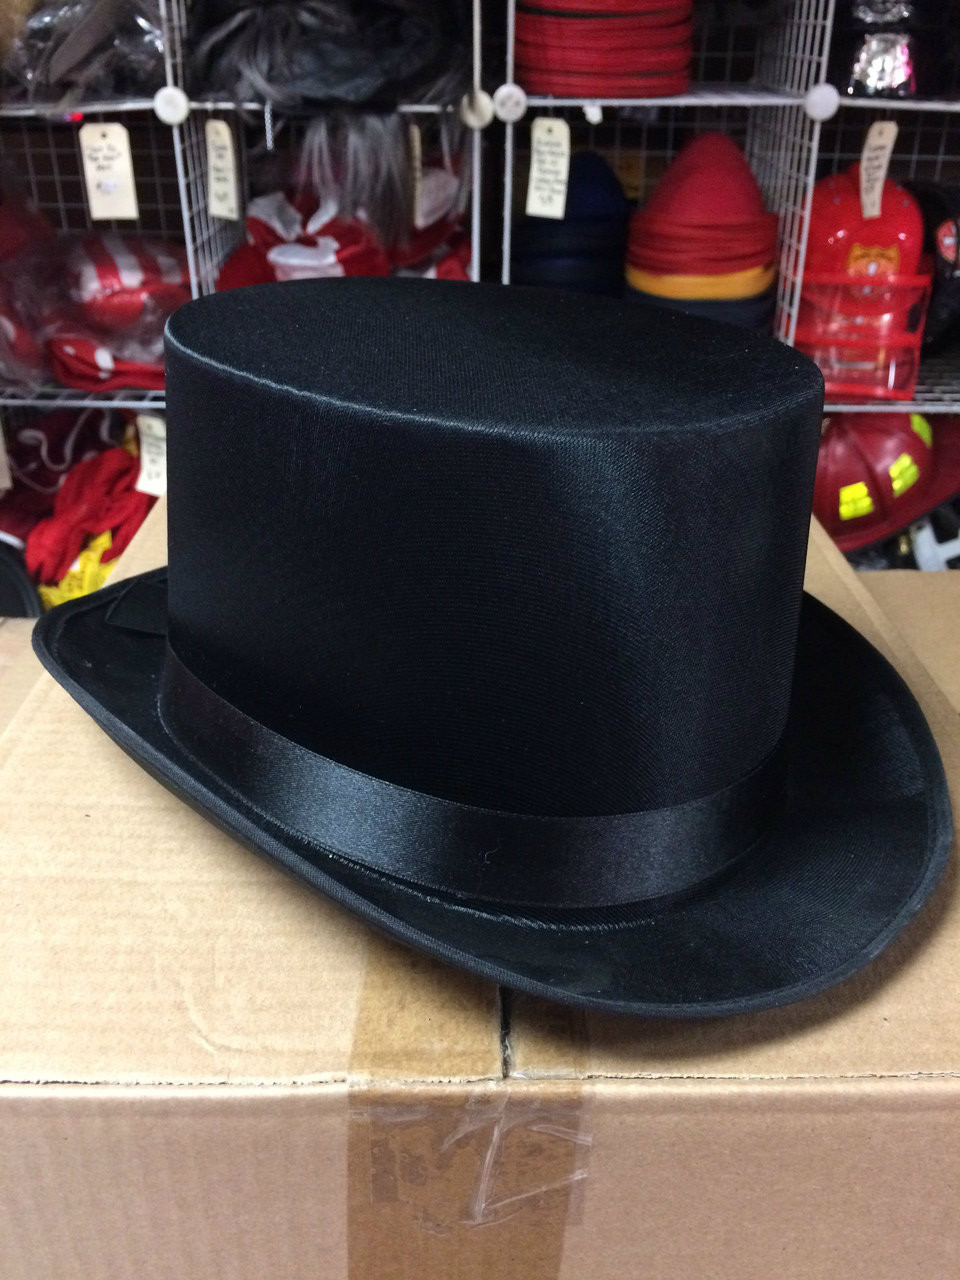 8404a412b5f ... 12pc Black Satin Top Hats. Image 1. Loading zoom